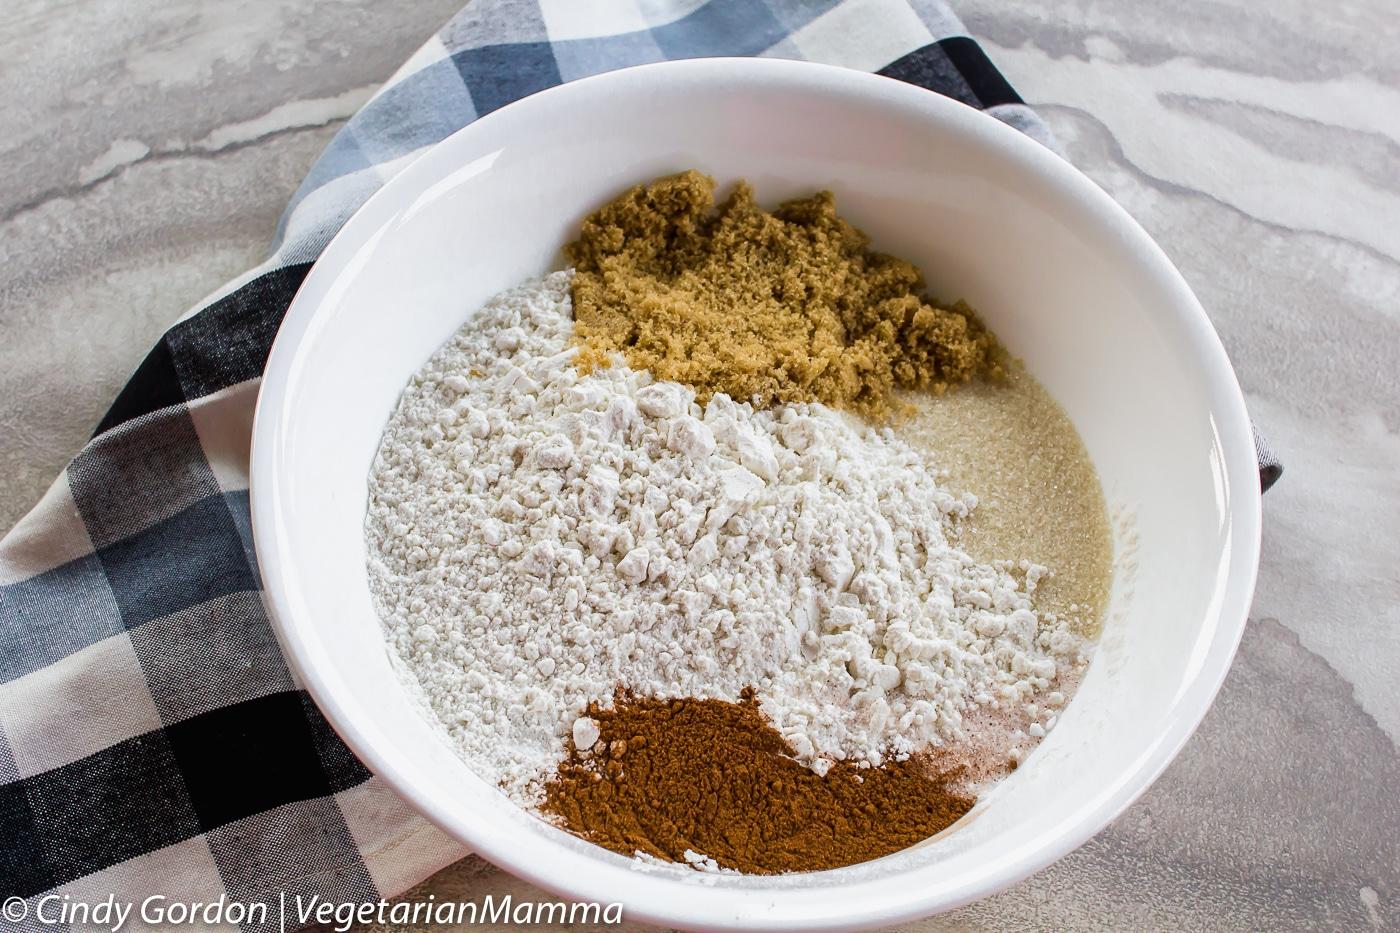 Dry ingredients for Gluten Free Pumpkin Bread